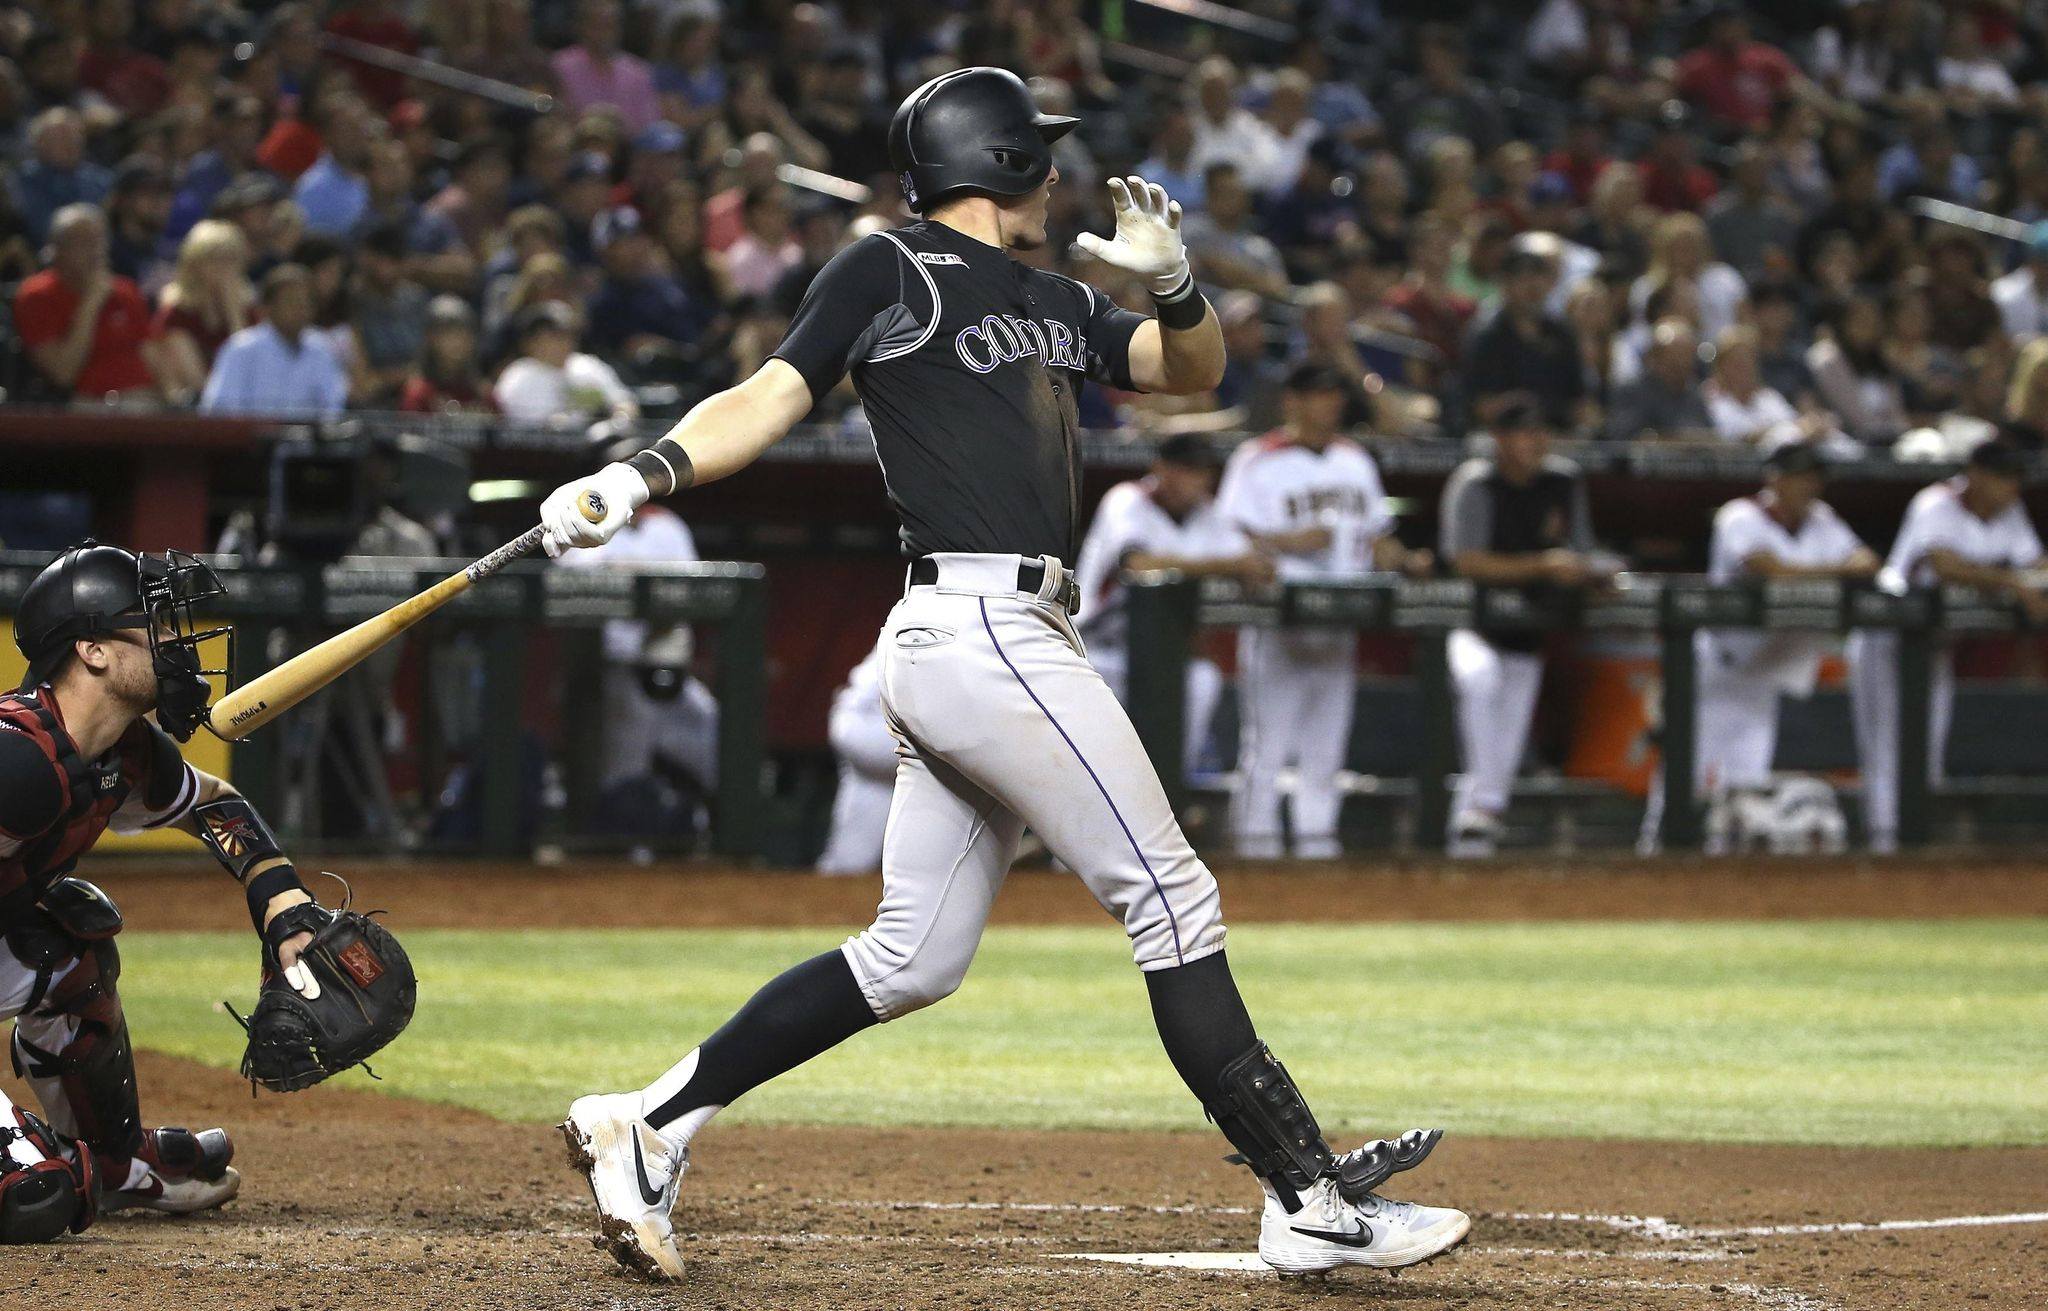 Rockies_diamondbacks_baseball_17981_s2048x1311